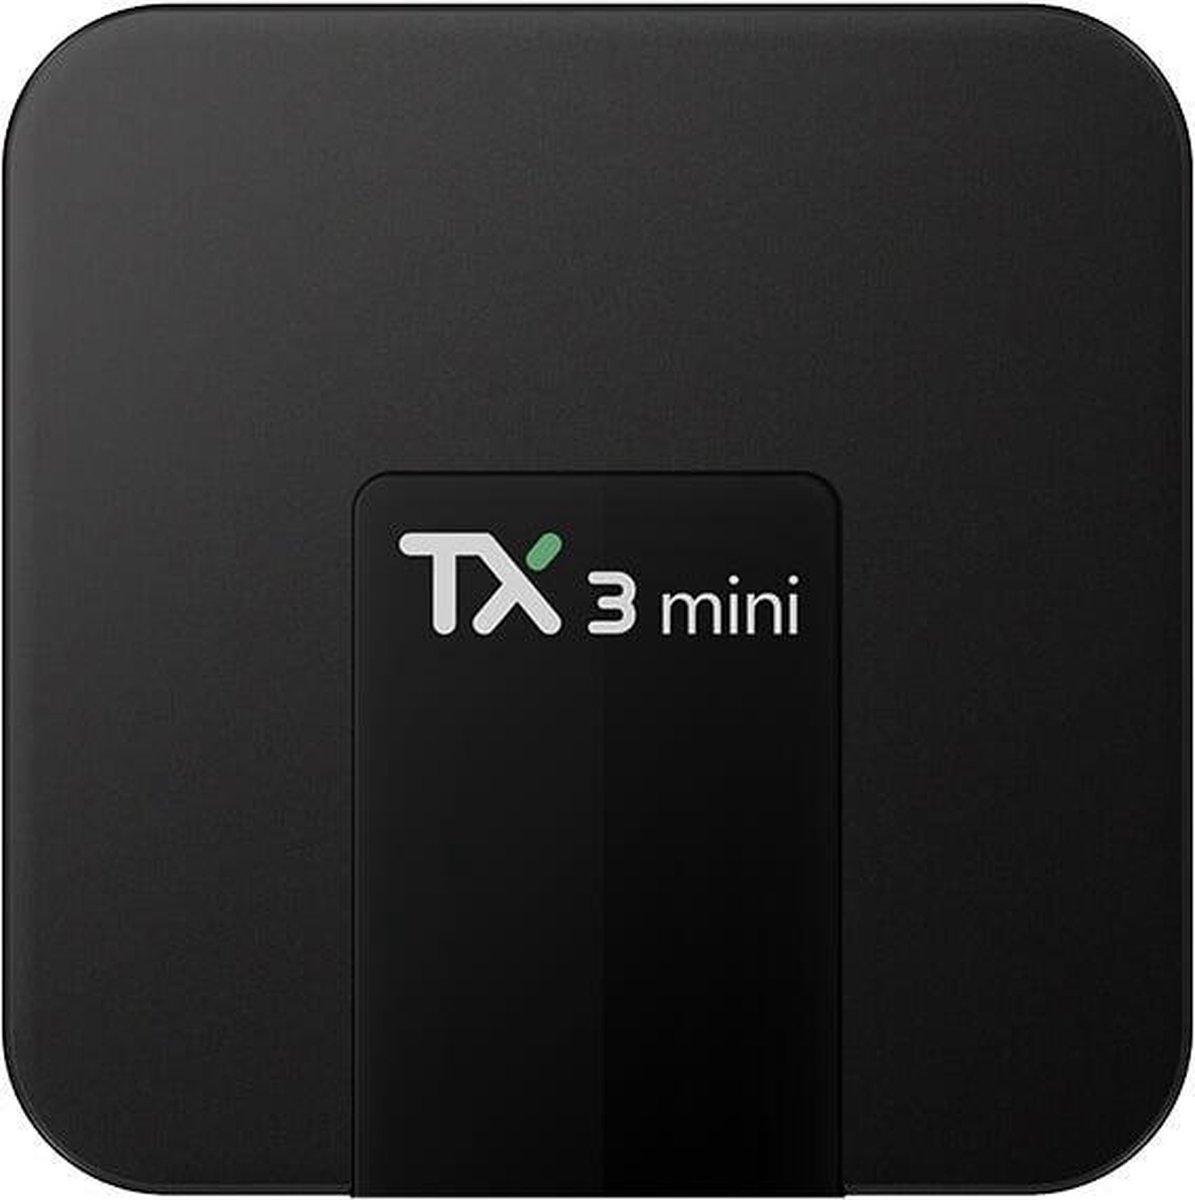 Lipa TX3 mini mediaplayer Android 7.1 - 16 GB / 2GB RAM - Kodi 18.3